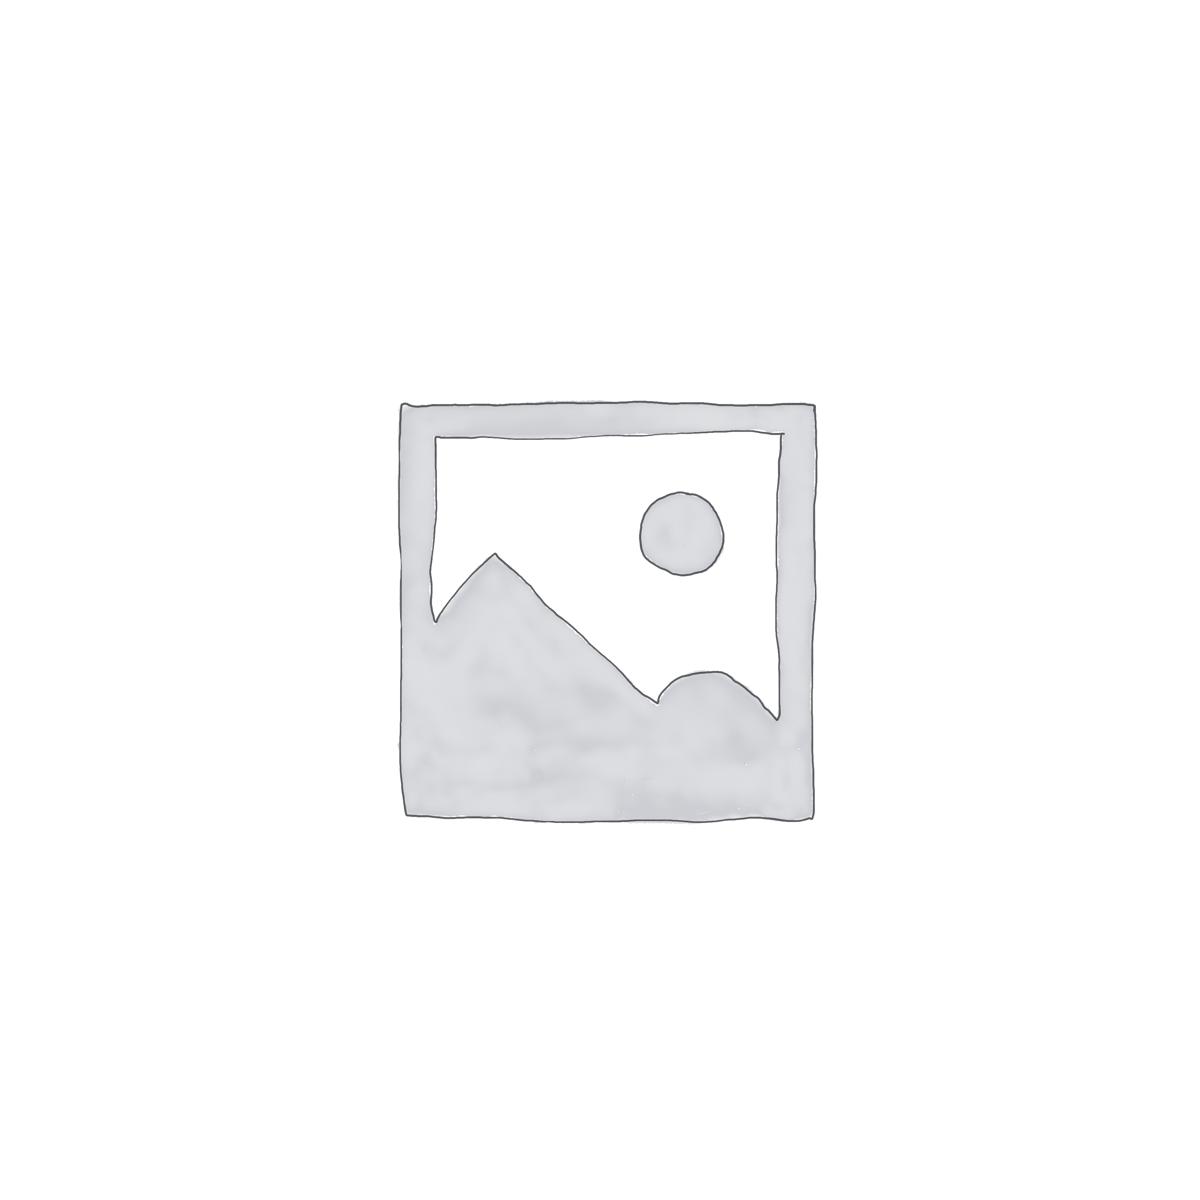 Realistic Sea Landscape with Wood Bridge Wallpaper Mural